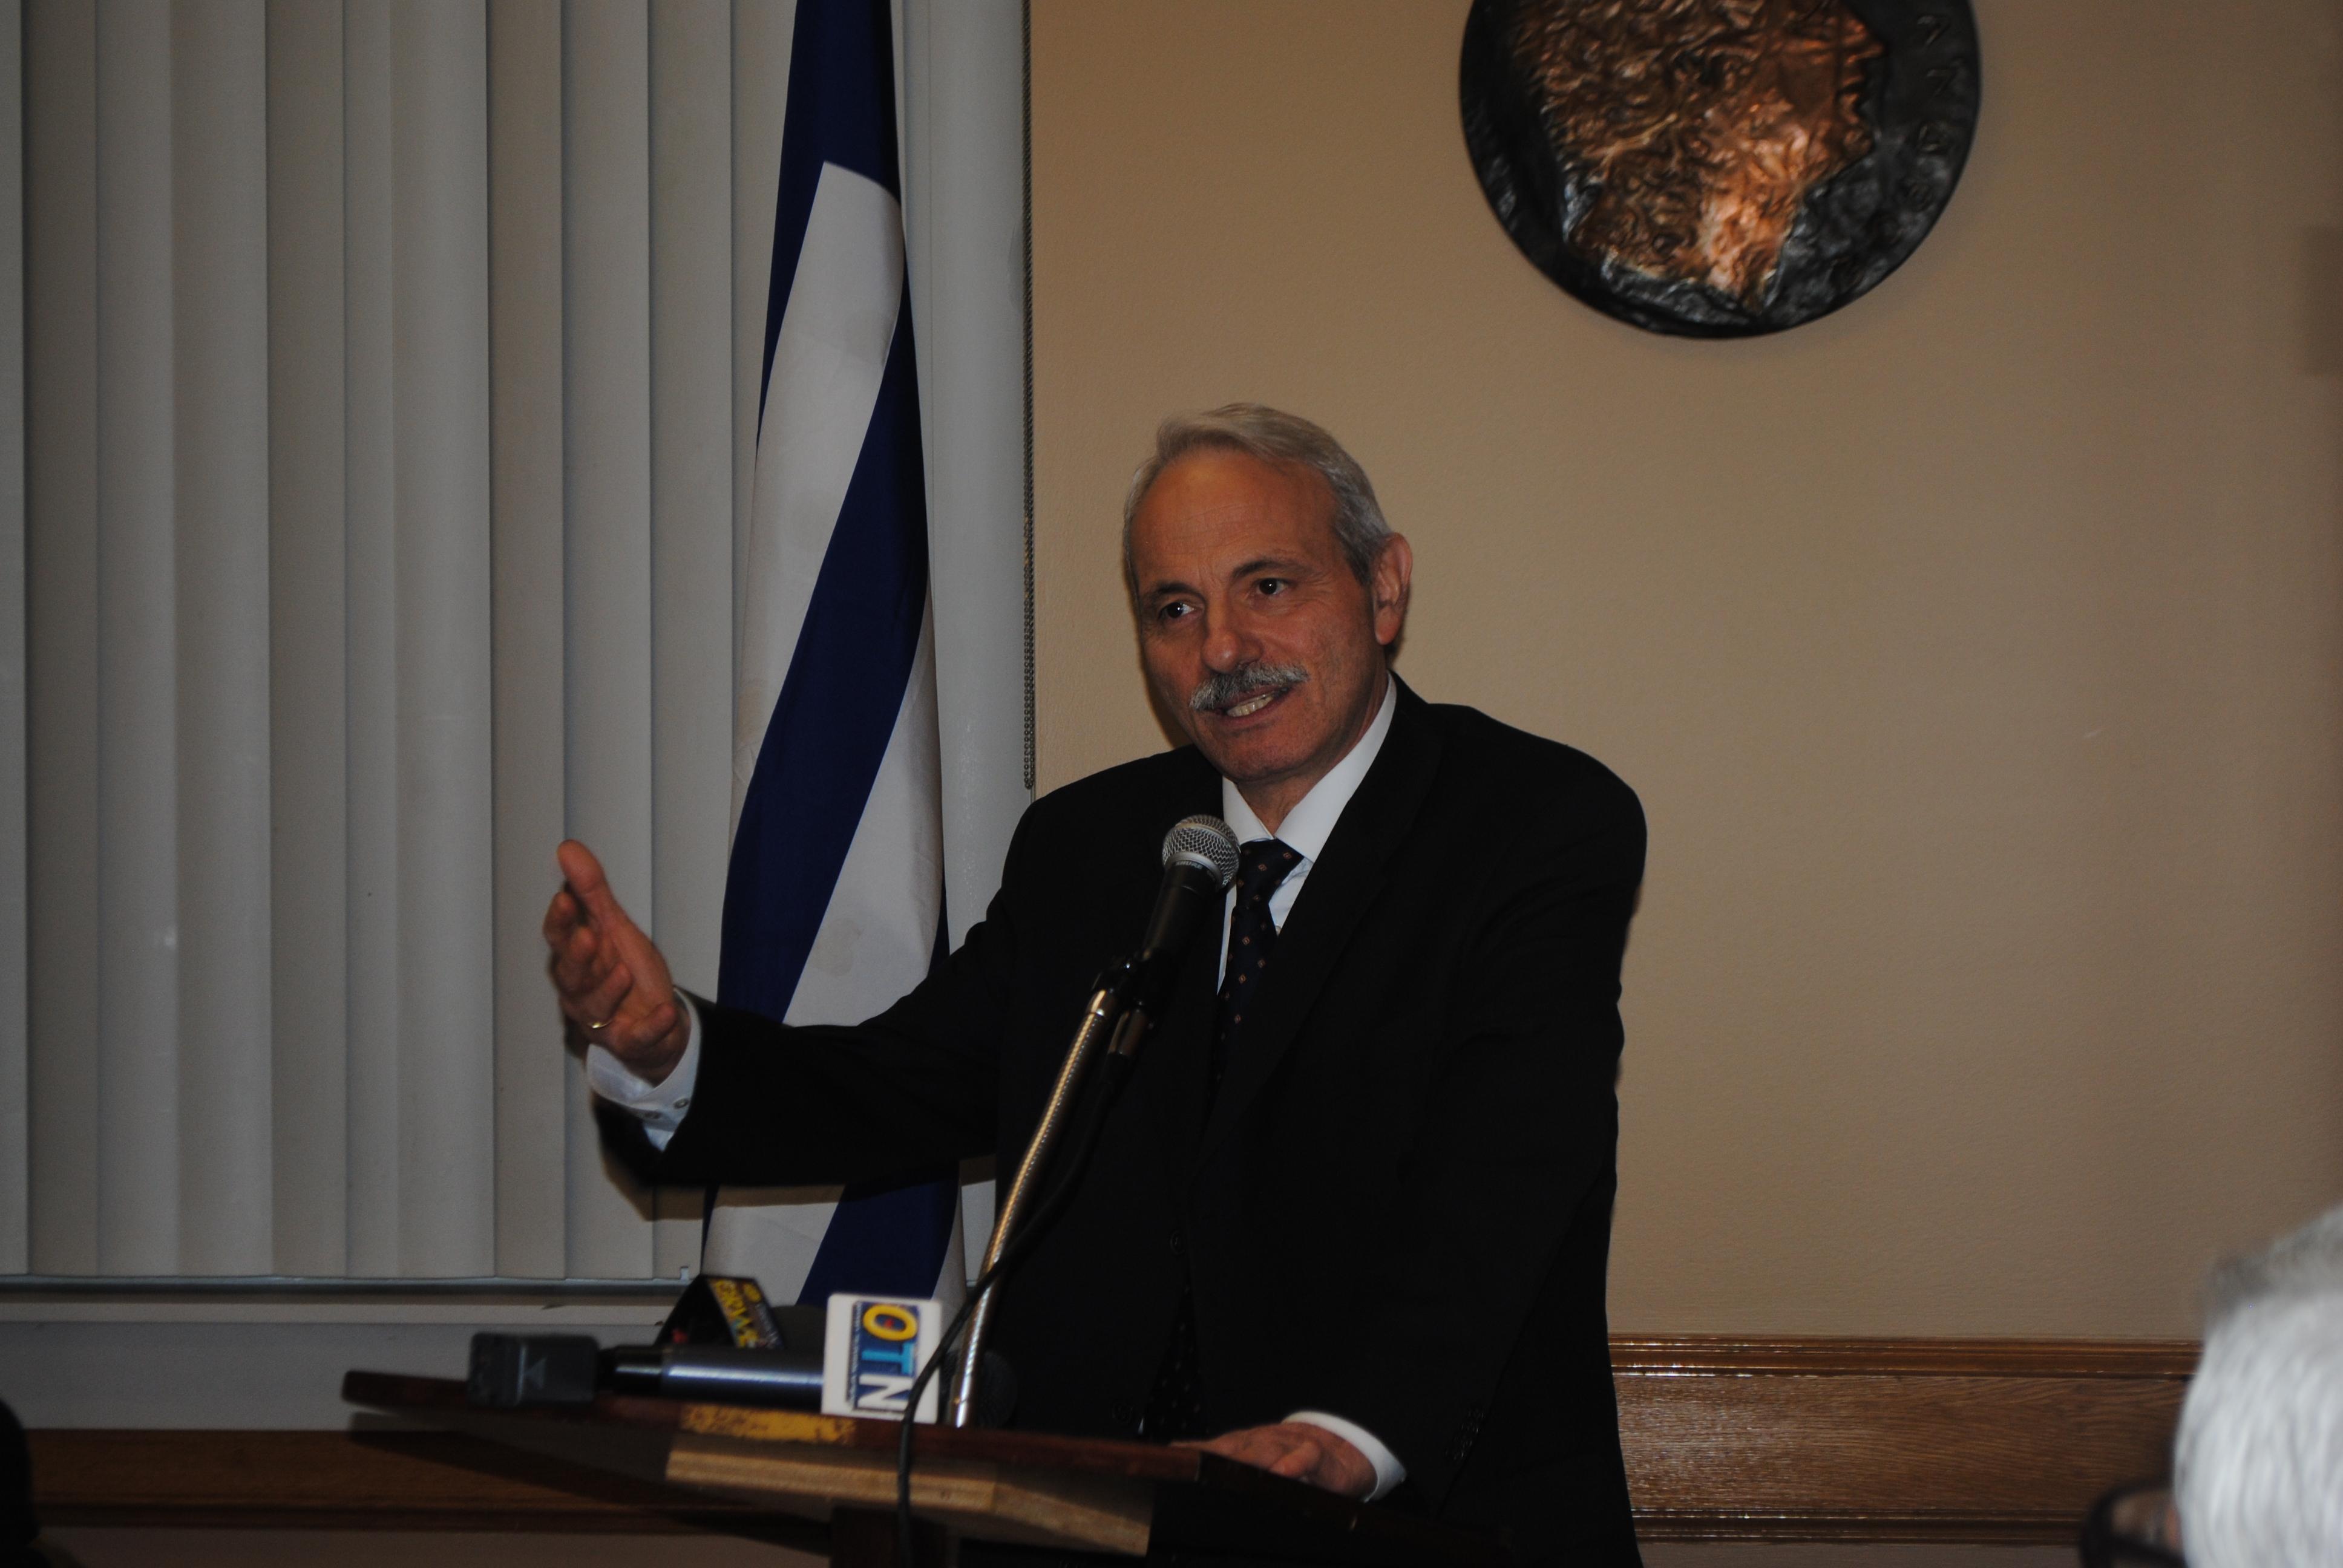 "H πρώτη συνέντευξη του νέου Πρέσβη της Ελλάδος στον Καναδά  κ. Γεώργιου Μαρκαντωνάτου στην εφημερίδα ""Embassy"""